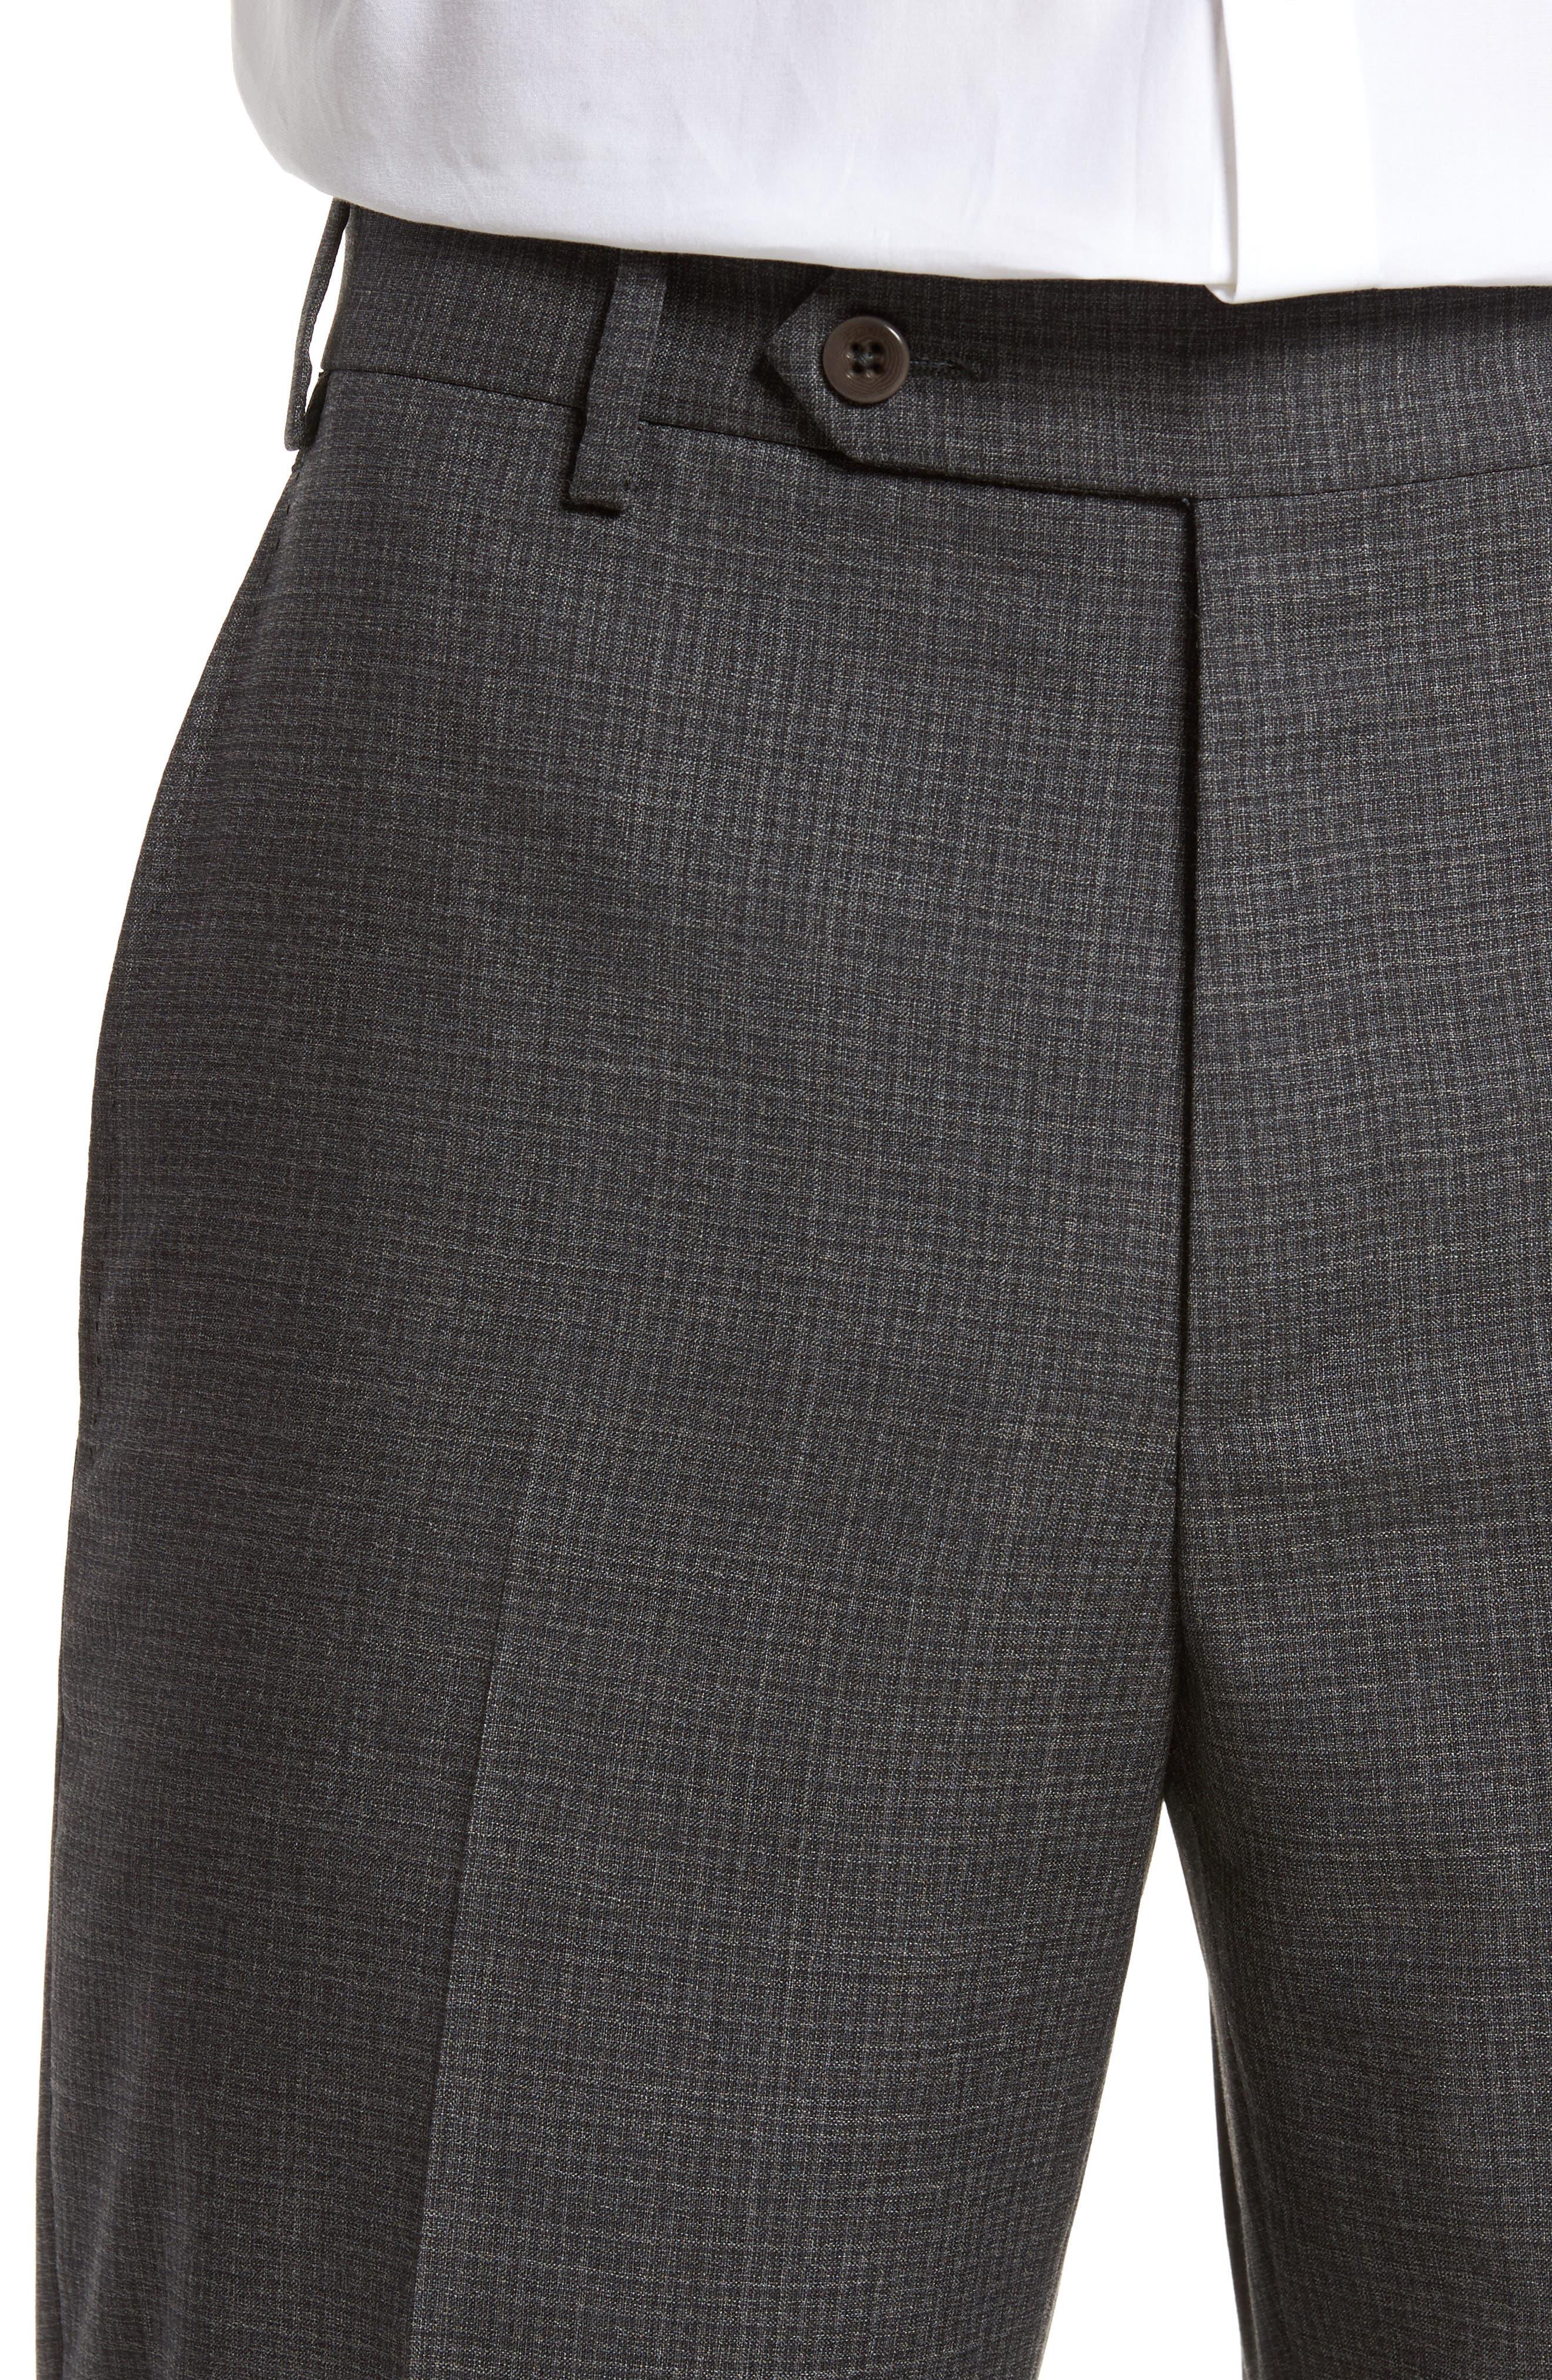 Devon Flat Front Check Wool Trousers,                             Alternate thumbnail 4, color,                             Dark Grey